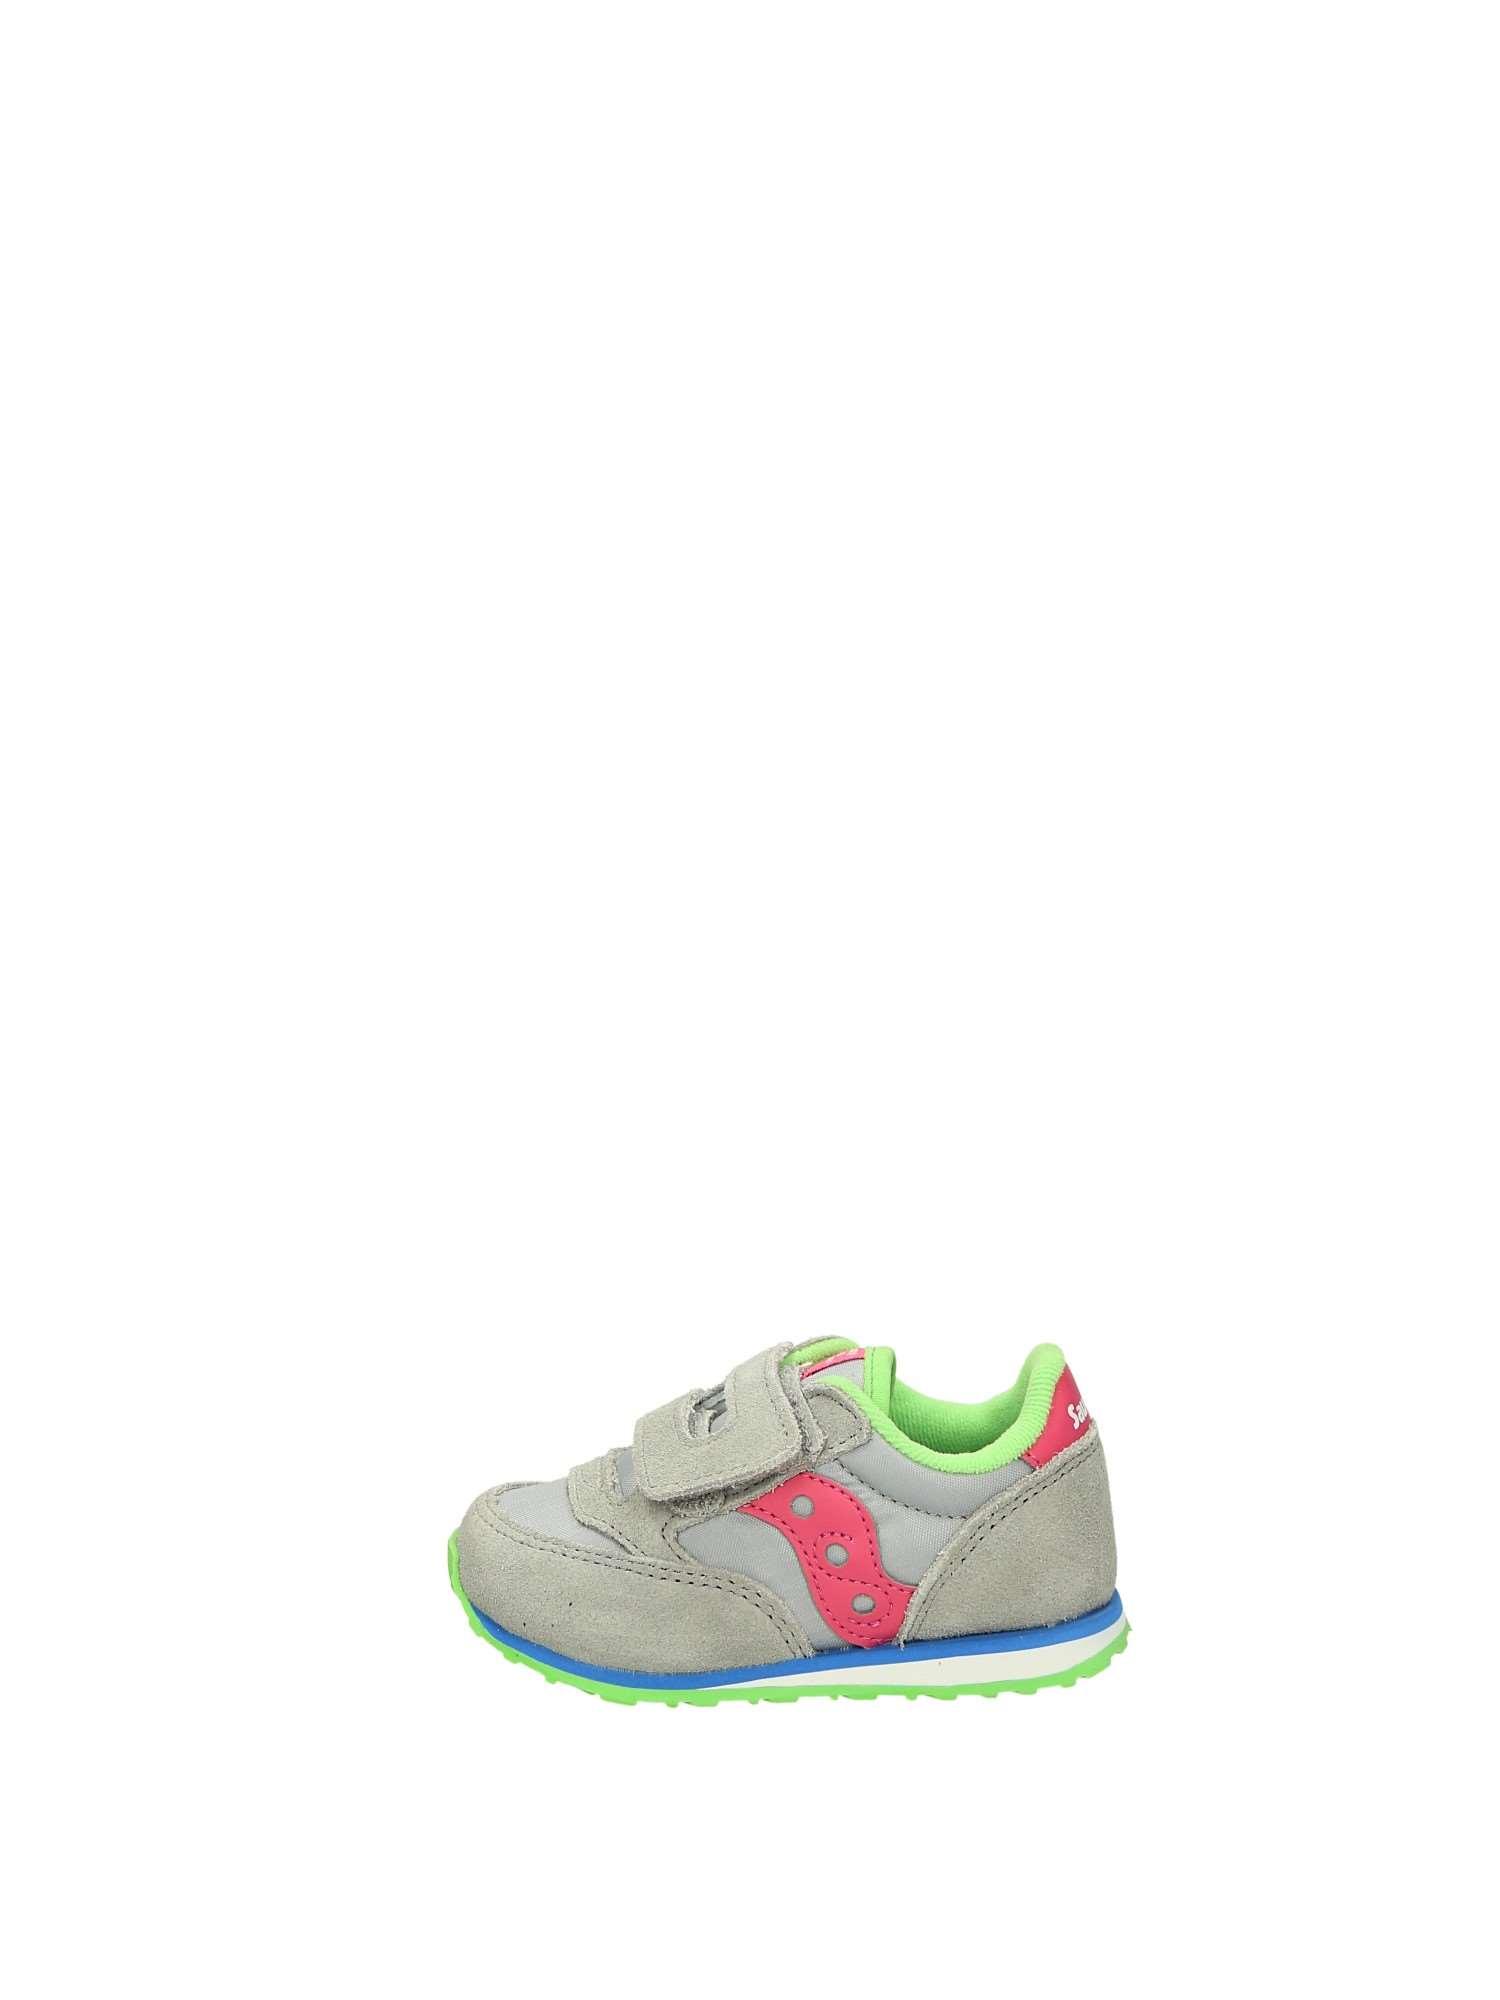 Saucony JAZZ BABY Grigio Rosa Scarpe Bambina Sneakers ac58ab35eea